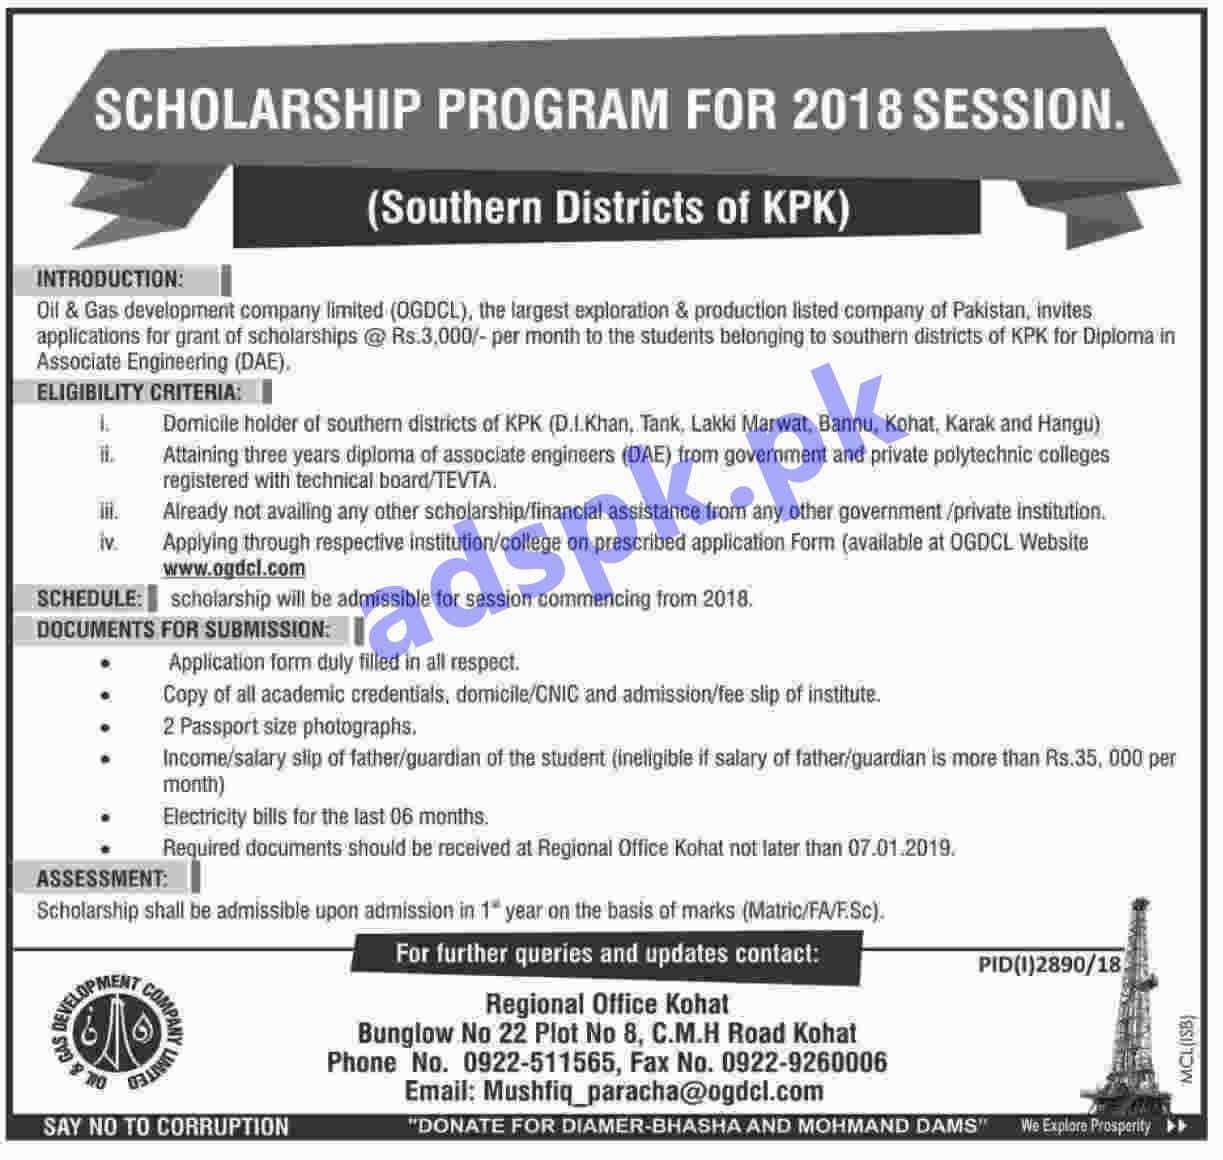 Ogdcl Scholarship Program Session 2018 For Southern Districts Of Kpk